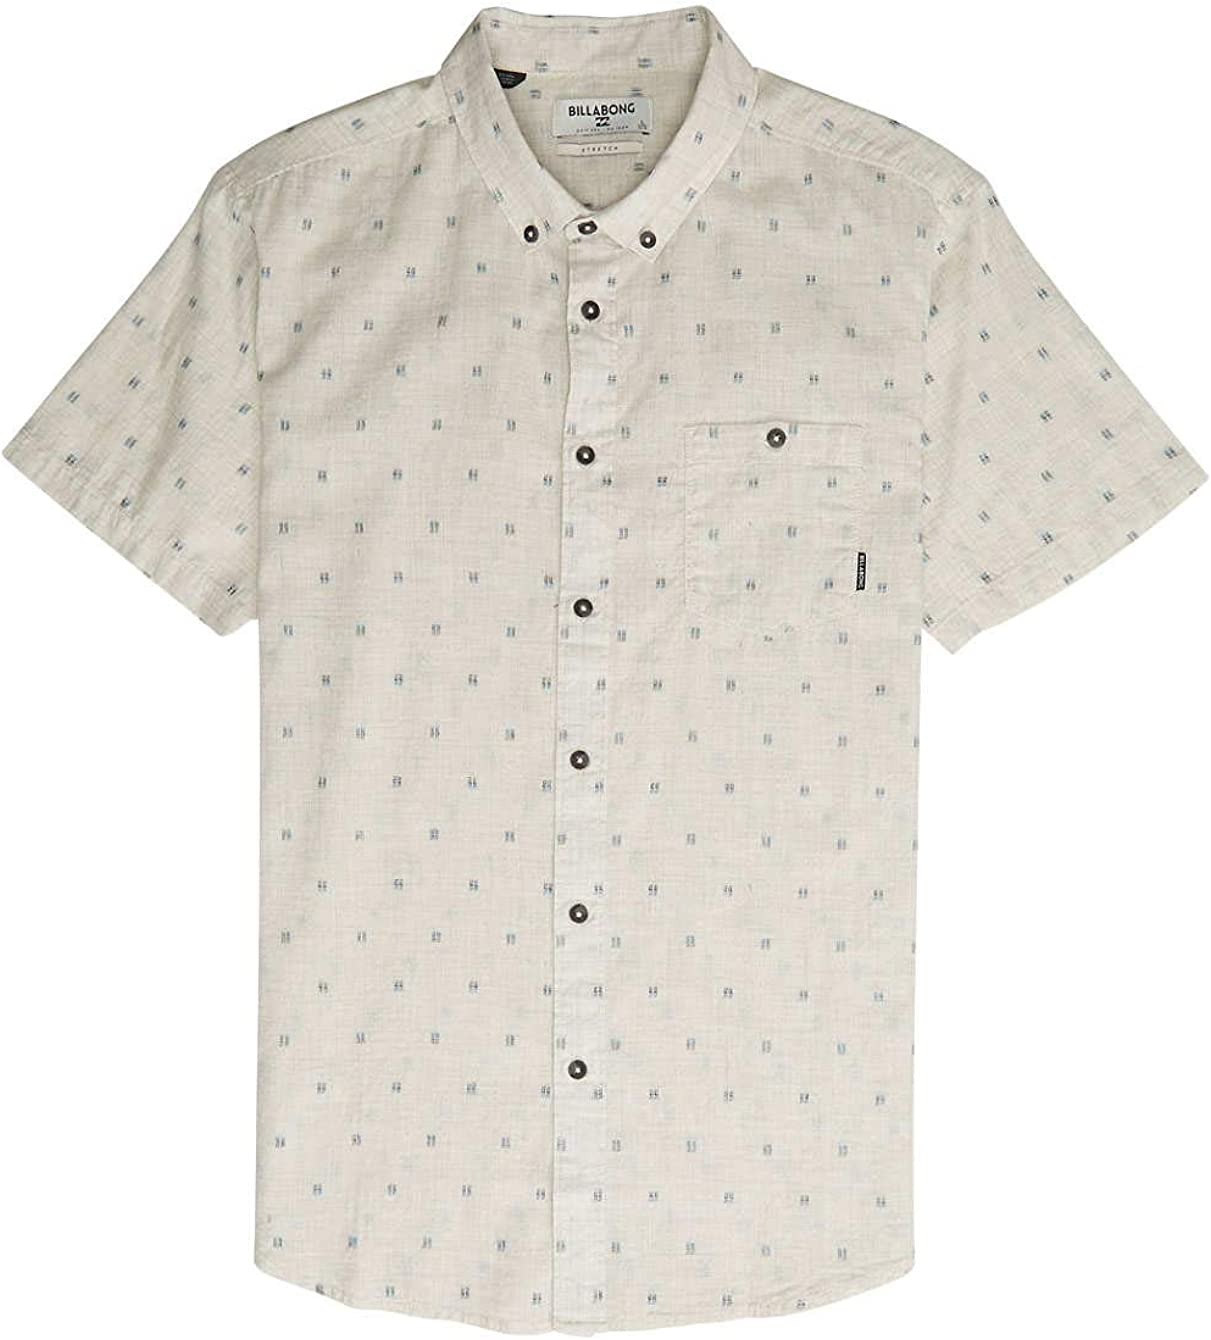 BILLABONG™ All Day Jacquard Shirt N1SH06BIP9: Billabong: Amazon.es: Ropa y accesorios